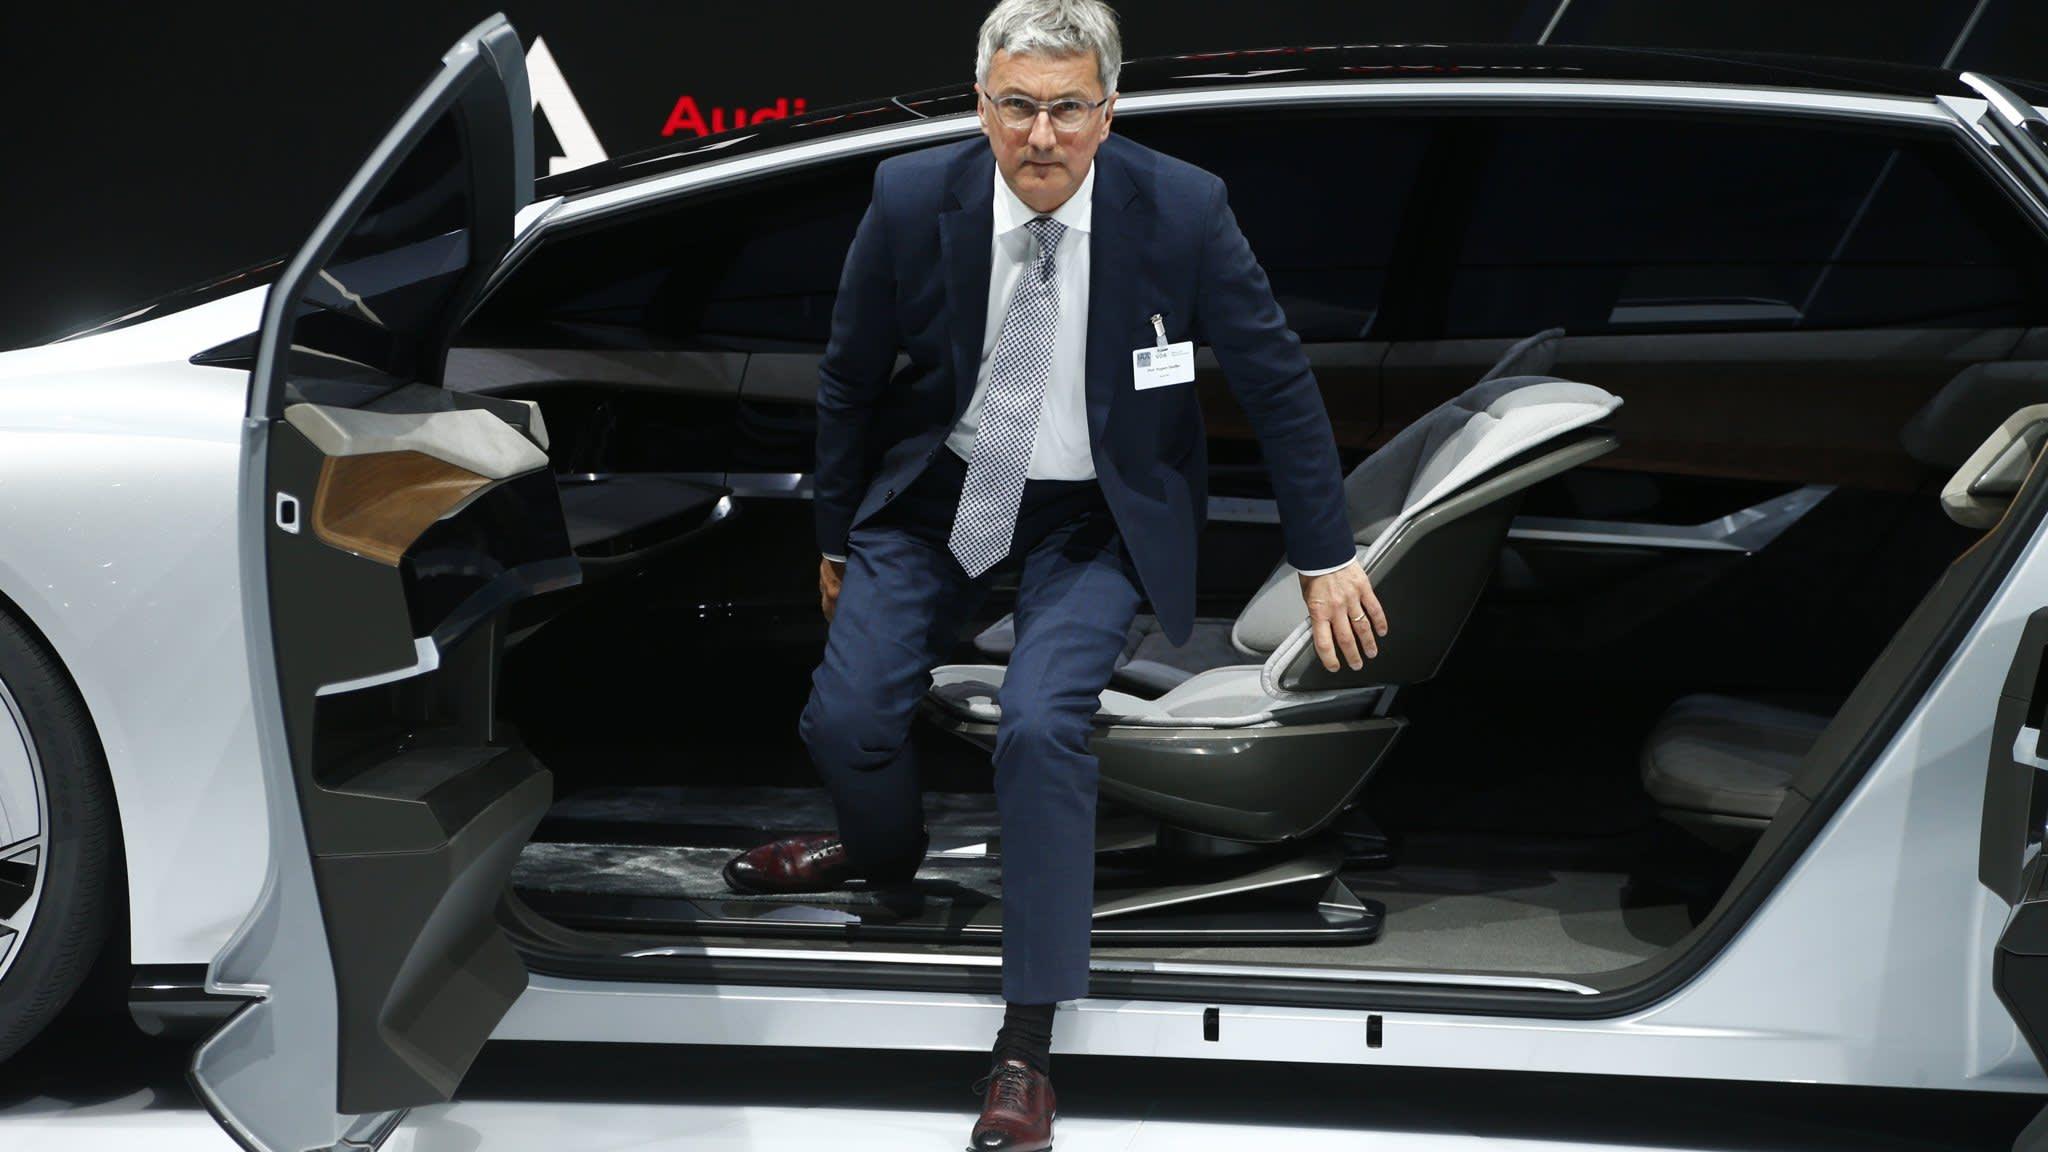 Firing Audi chief would 'humiliate' him, says VW board member